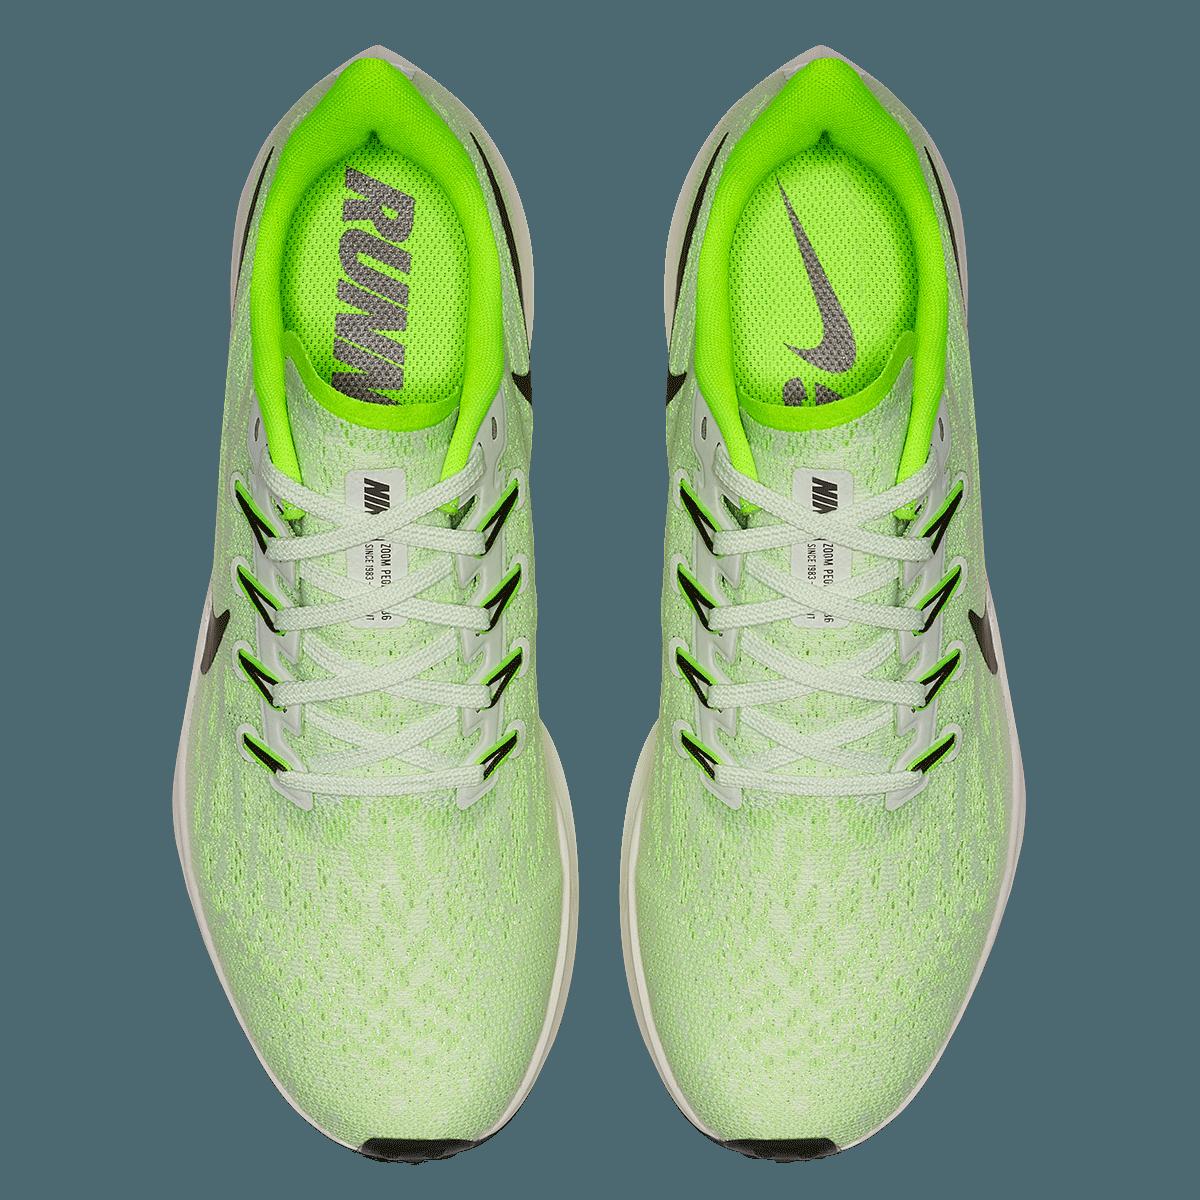 Nike Laufschuh Air Zoom Pegasus 36 grün fluoschwarz